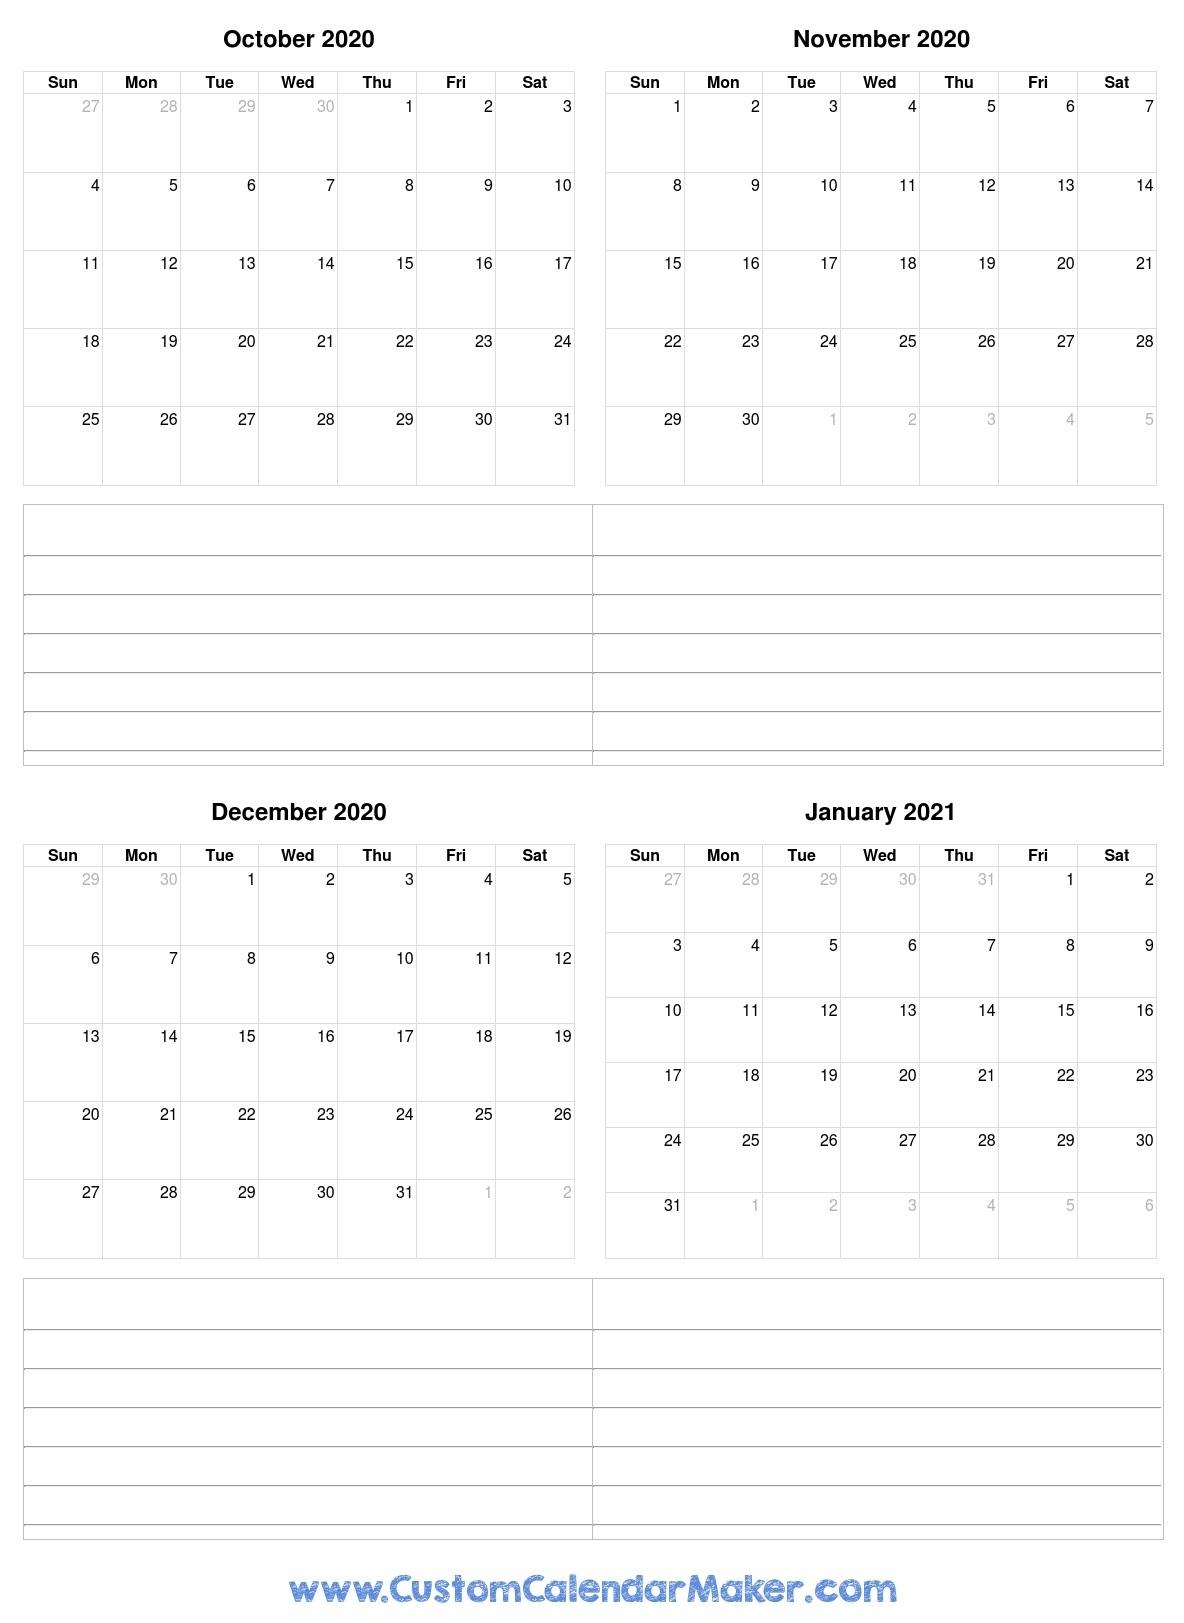 October 2020 Printable Calendars - Blank Pdf Templates Printable Calendar October 2020 To September 2021